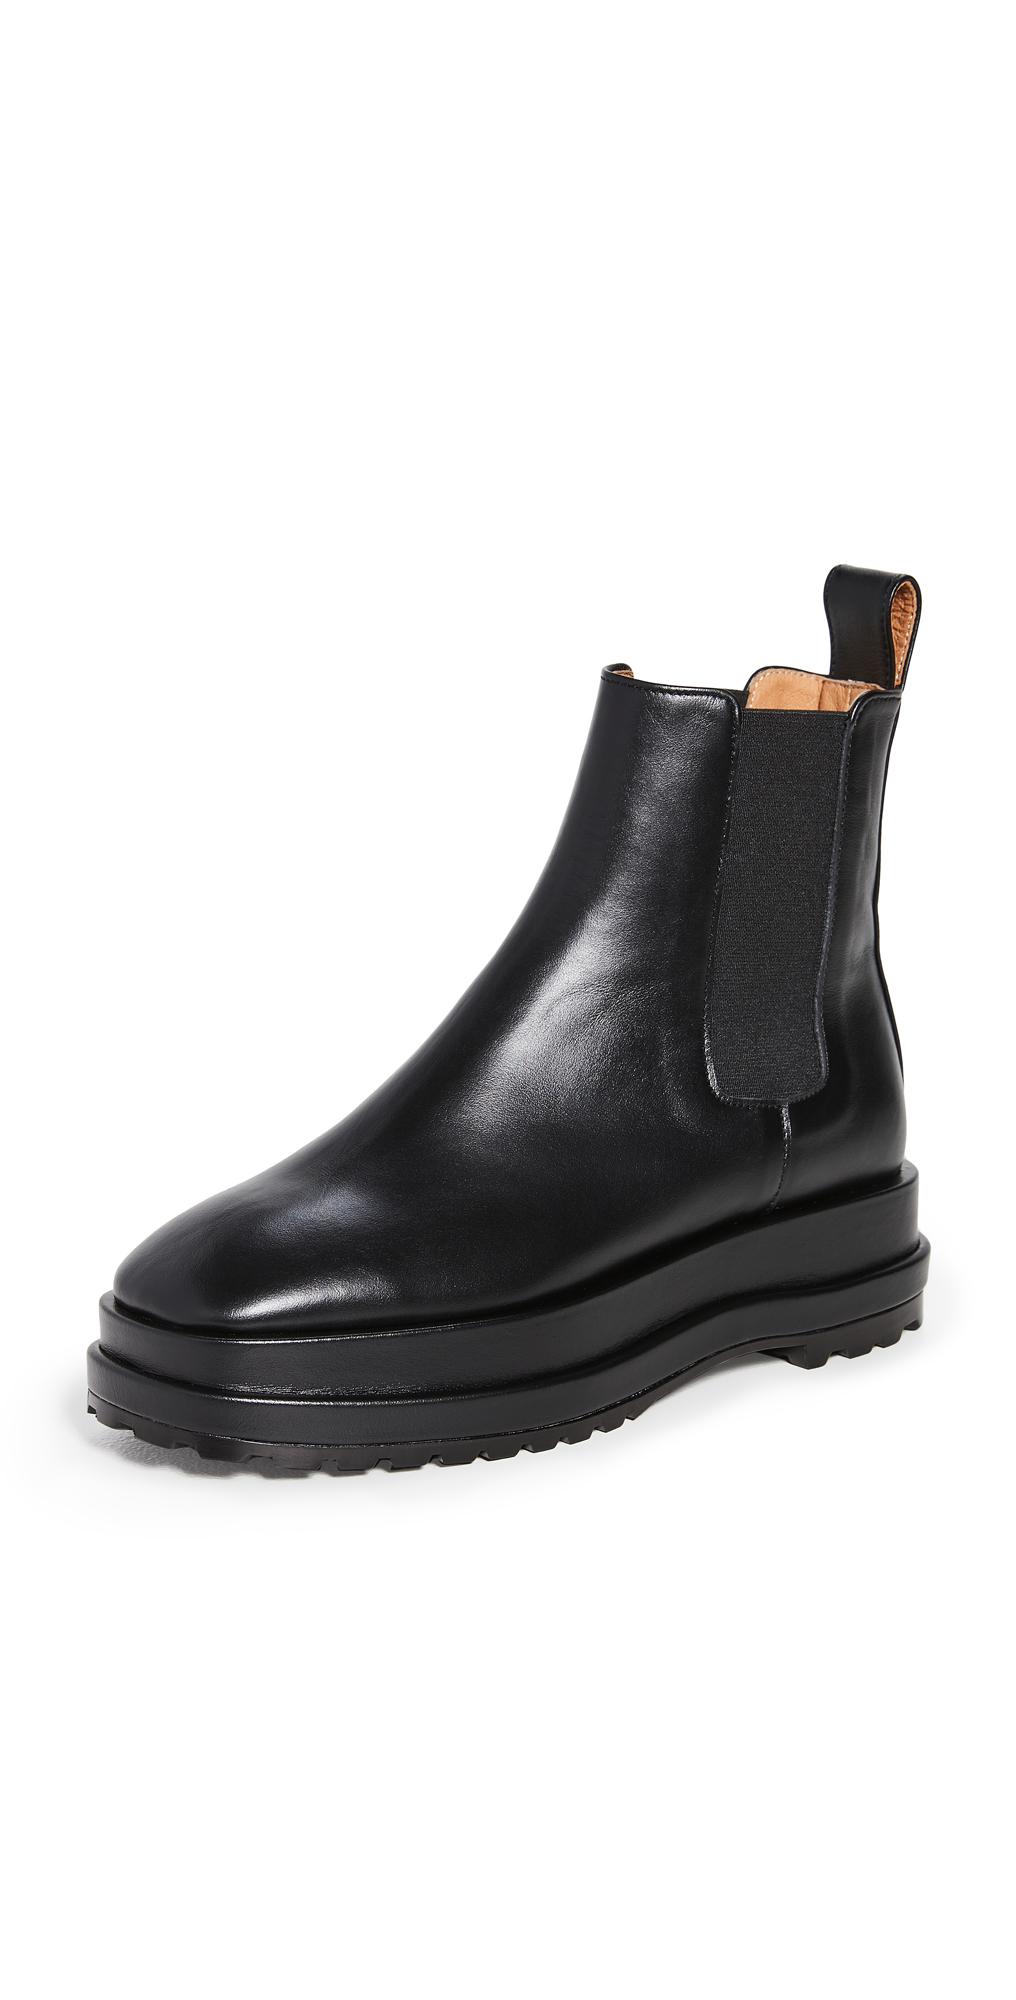 Reike Nen Platform Chelsea Boots